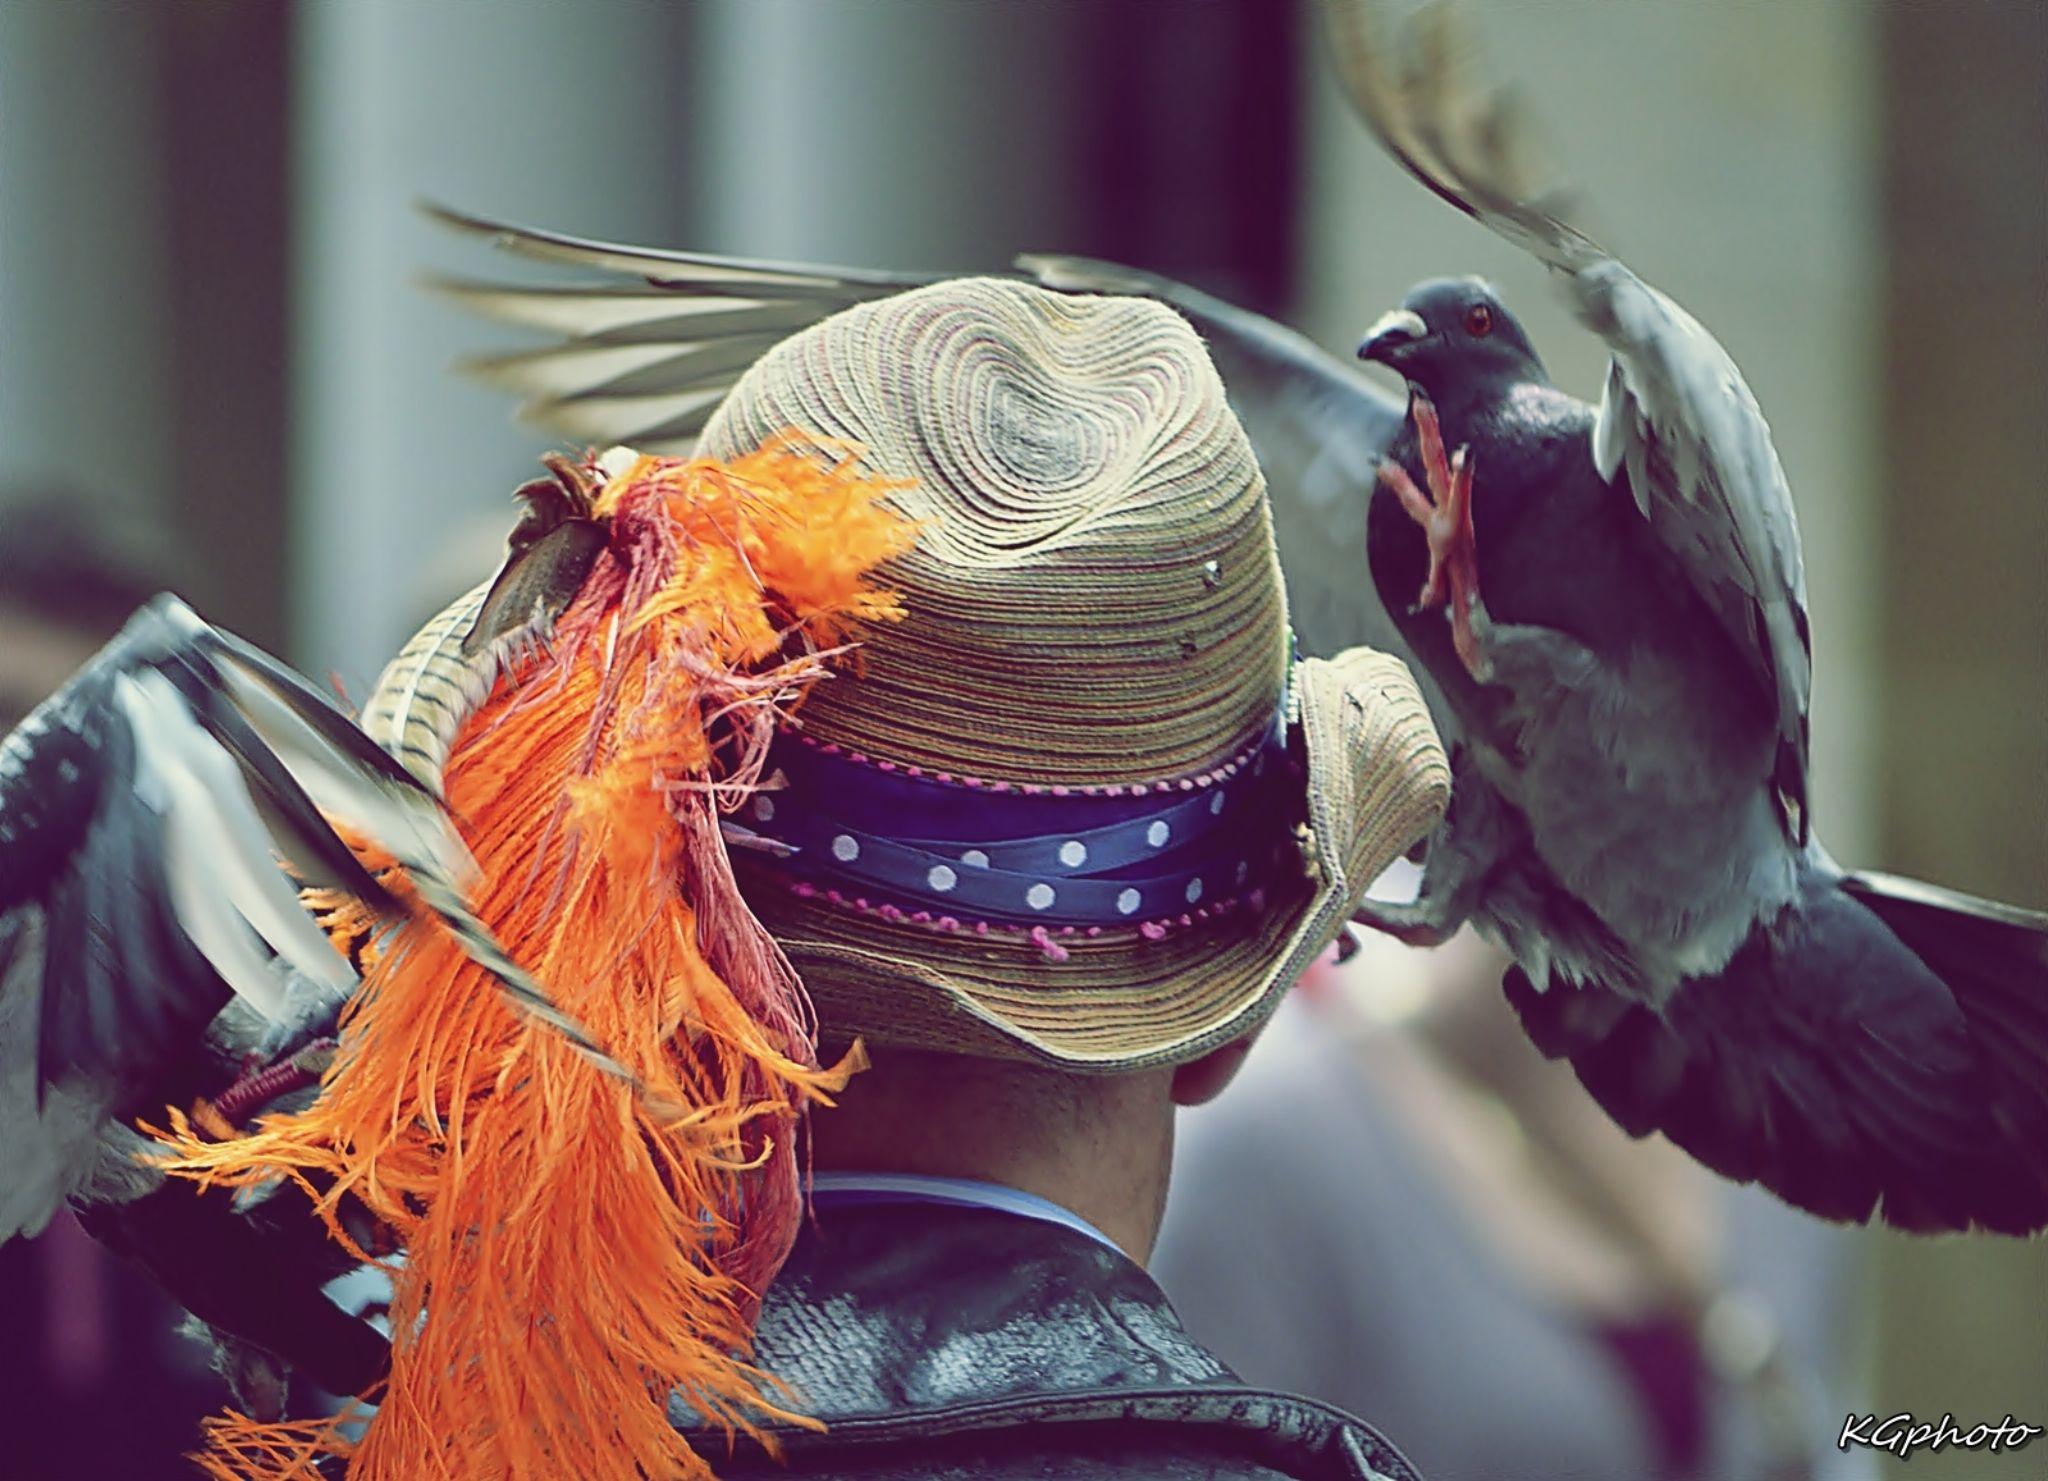 pigeon and hats by Kamil Gaweł